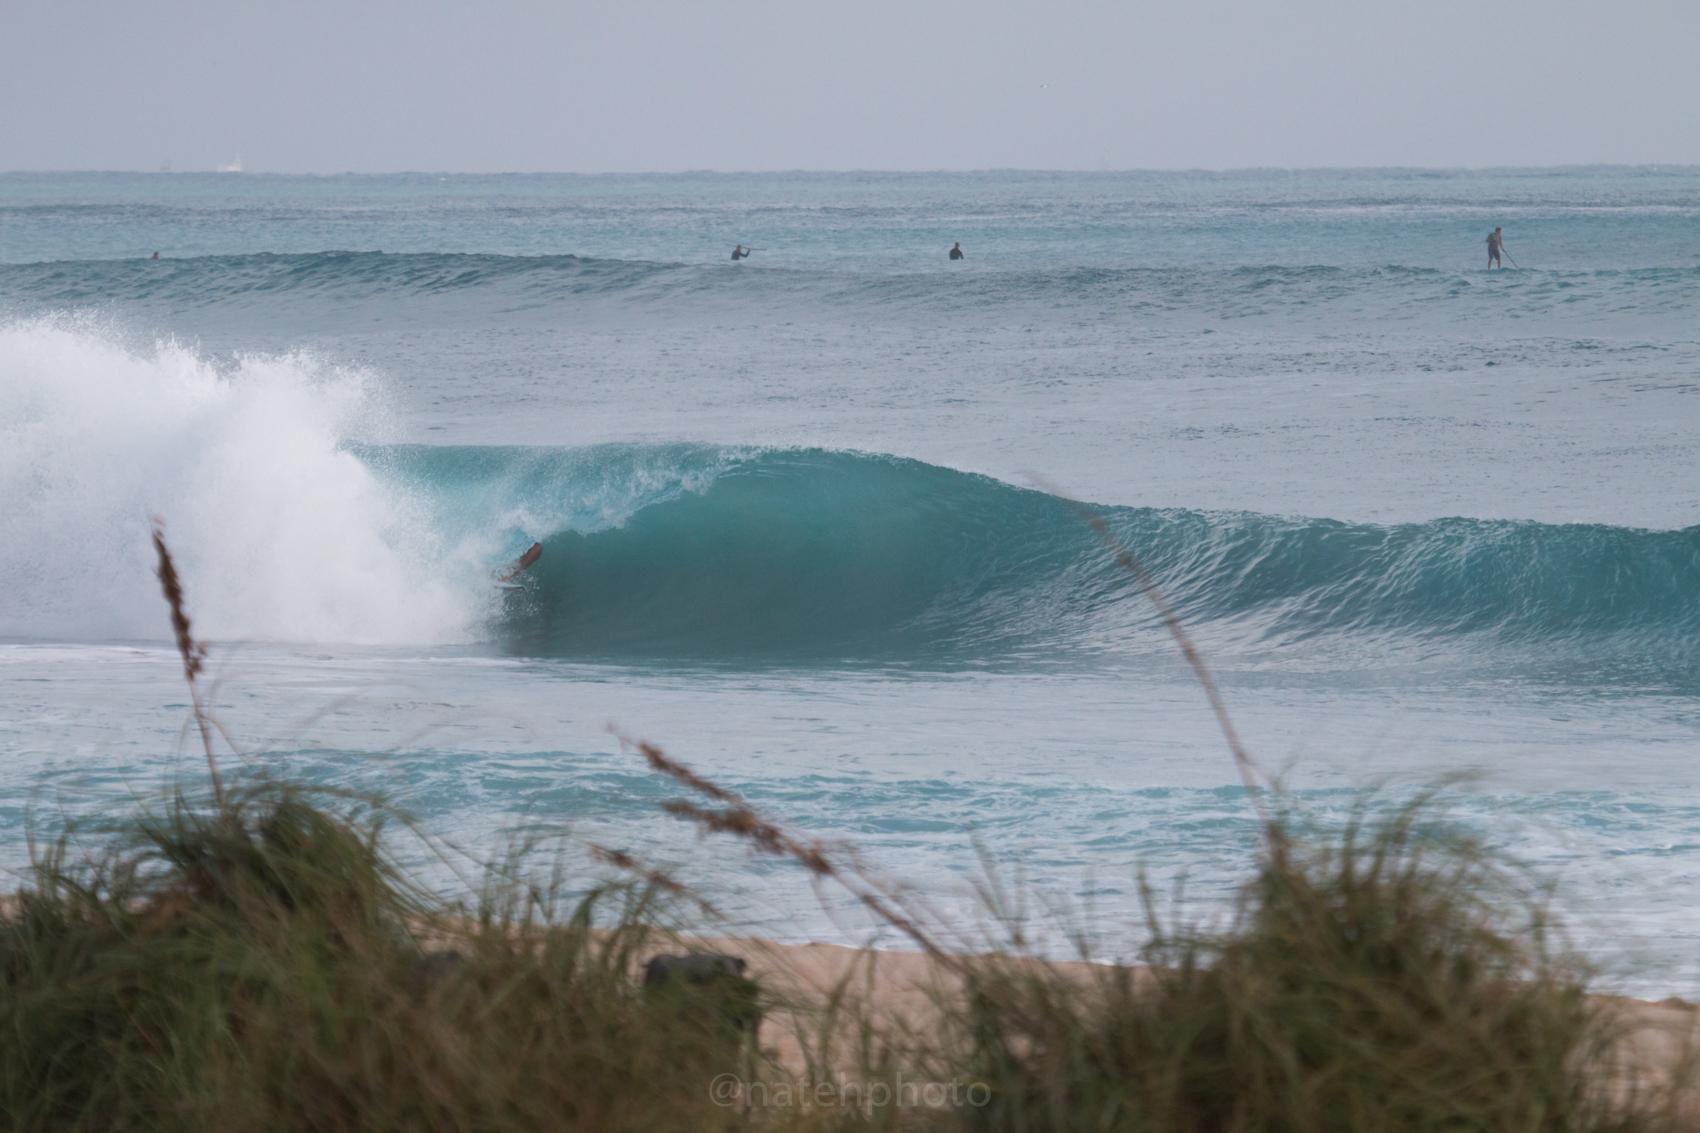 JanuarySwell_ReefRoad_Florida_natehphoto-4170.jpg